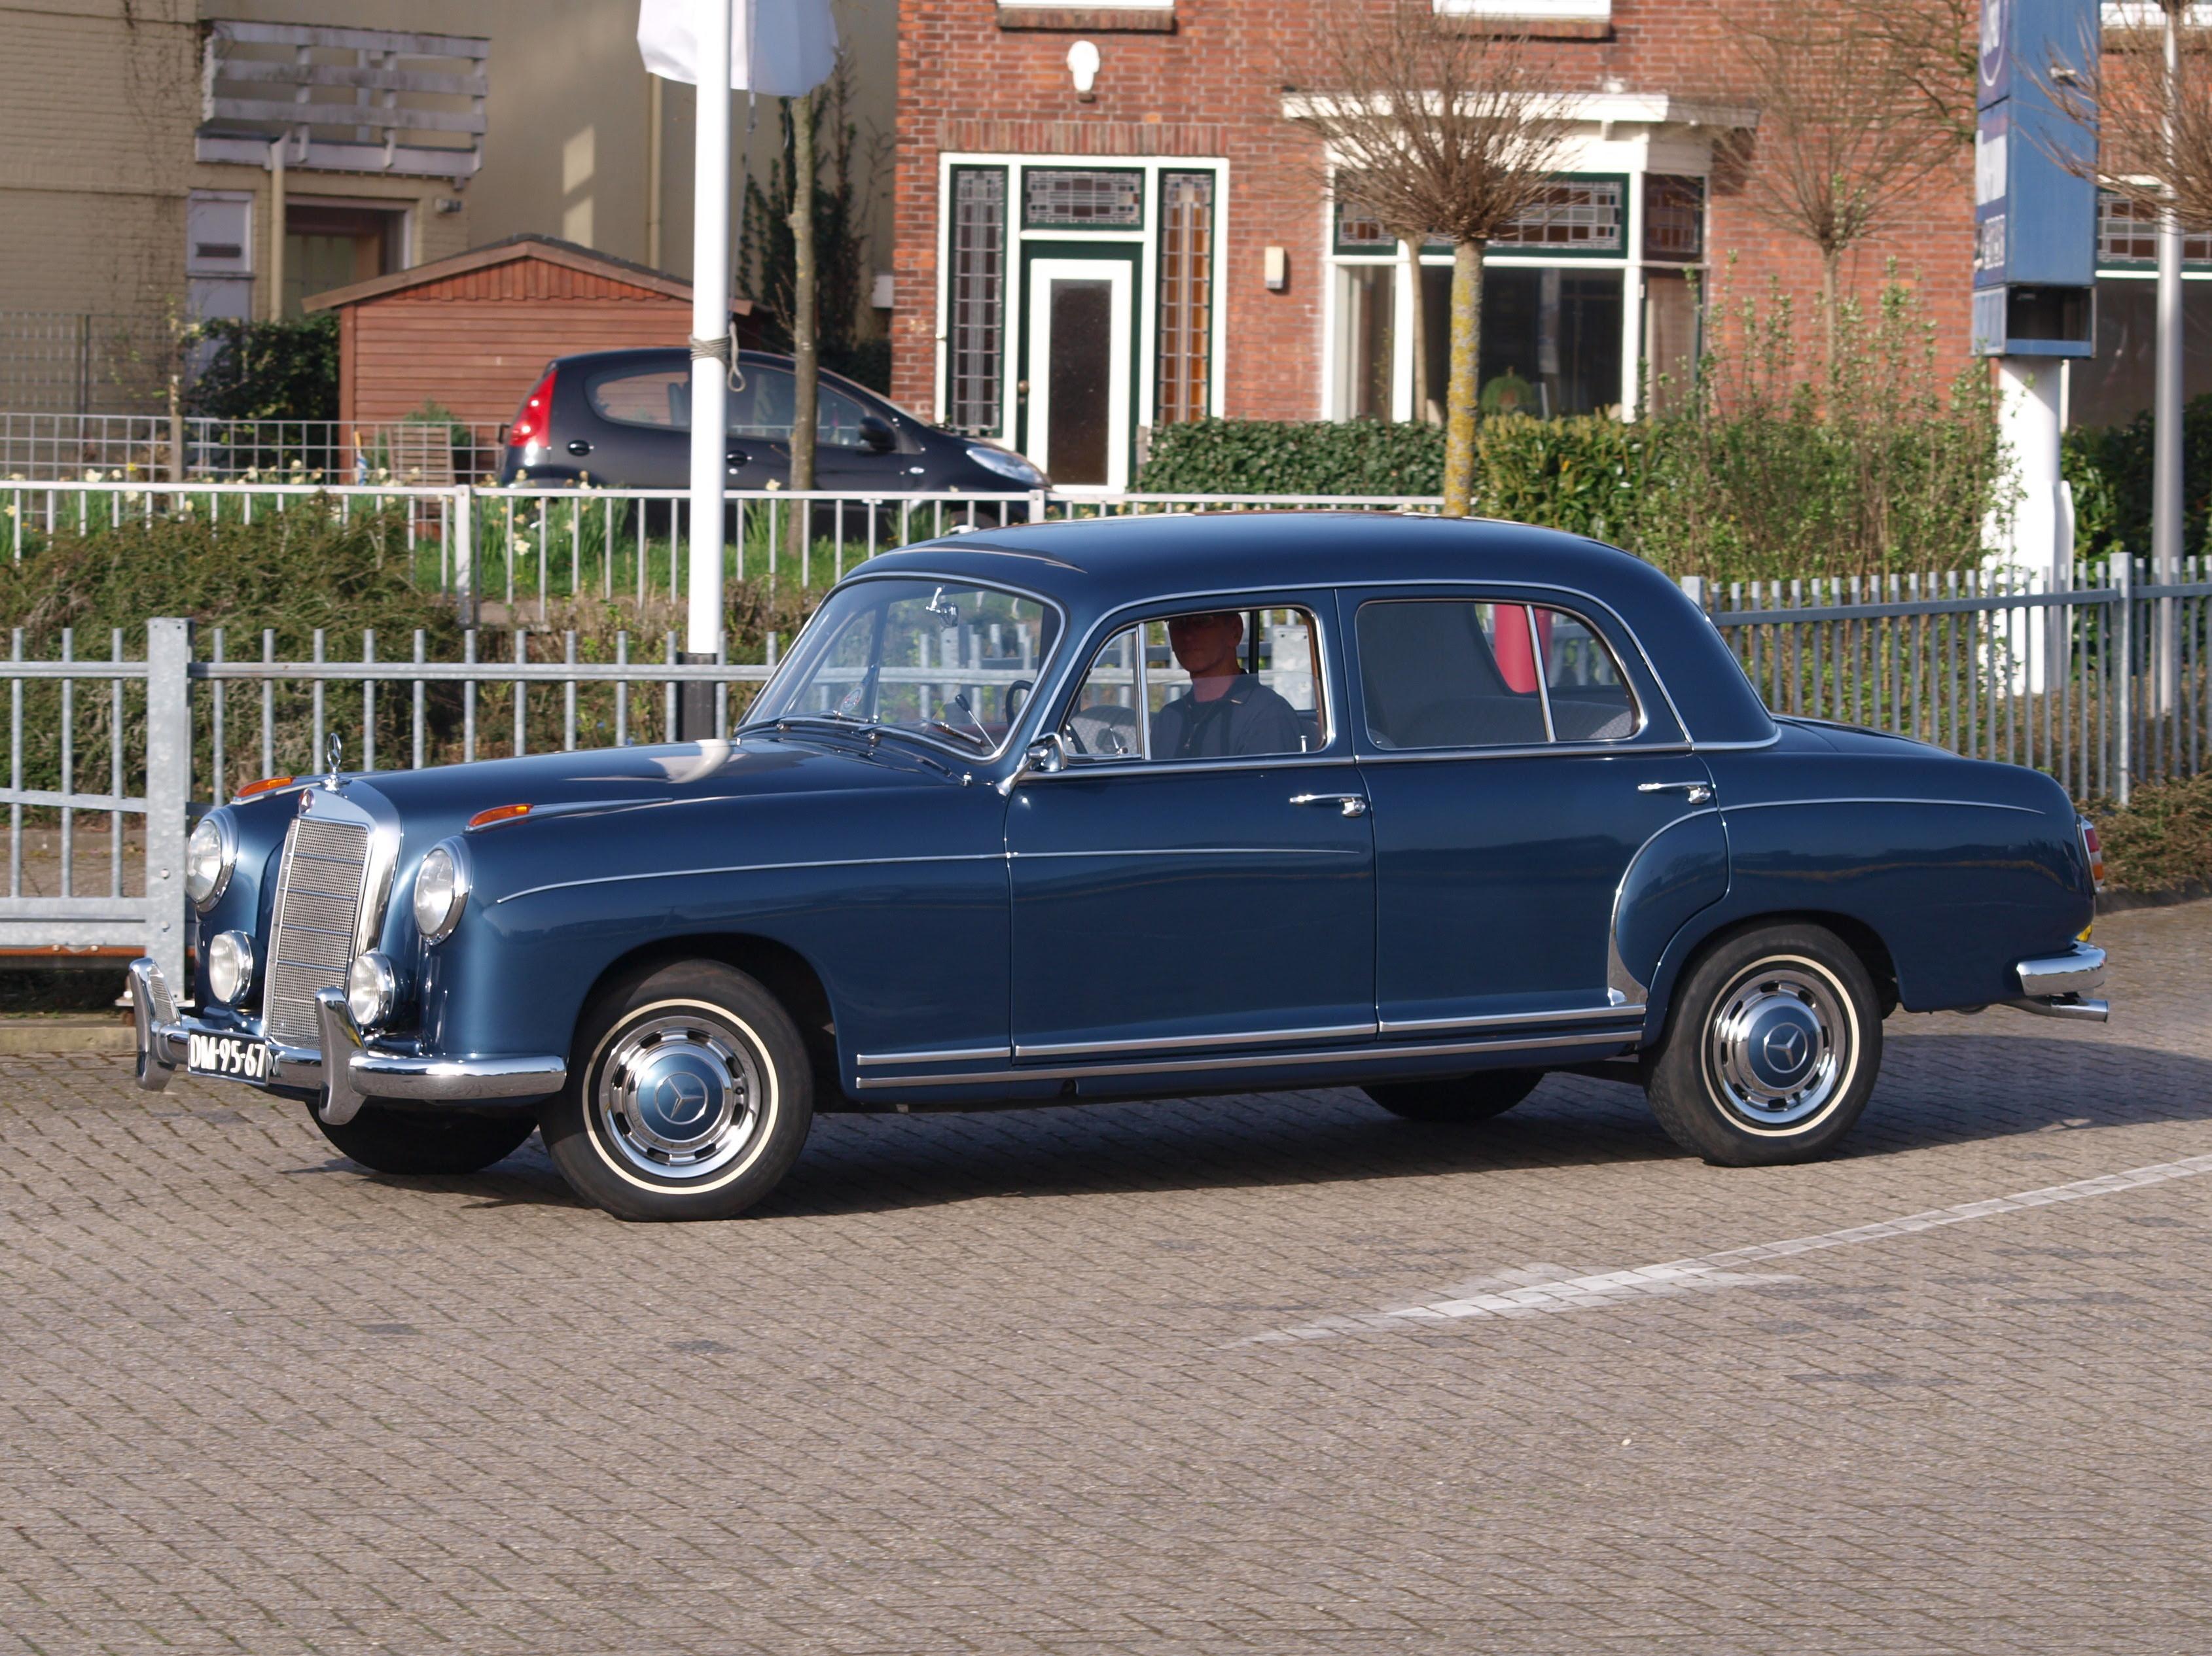 File:1959 Mercedes-Benz 220S pic3.JPG